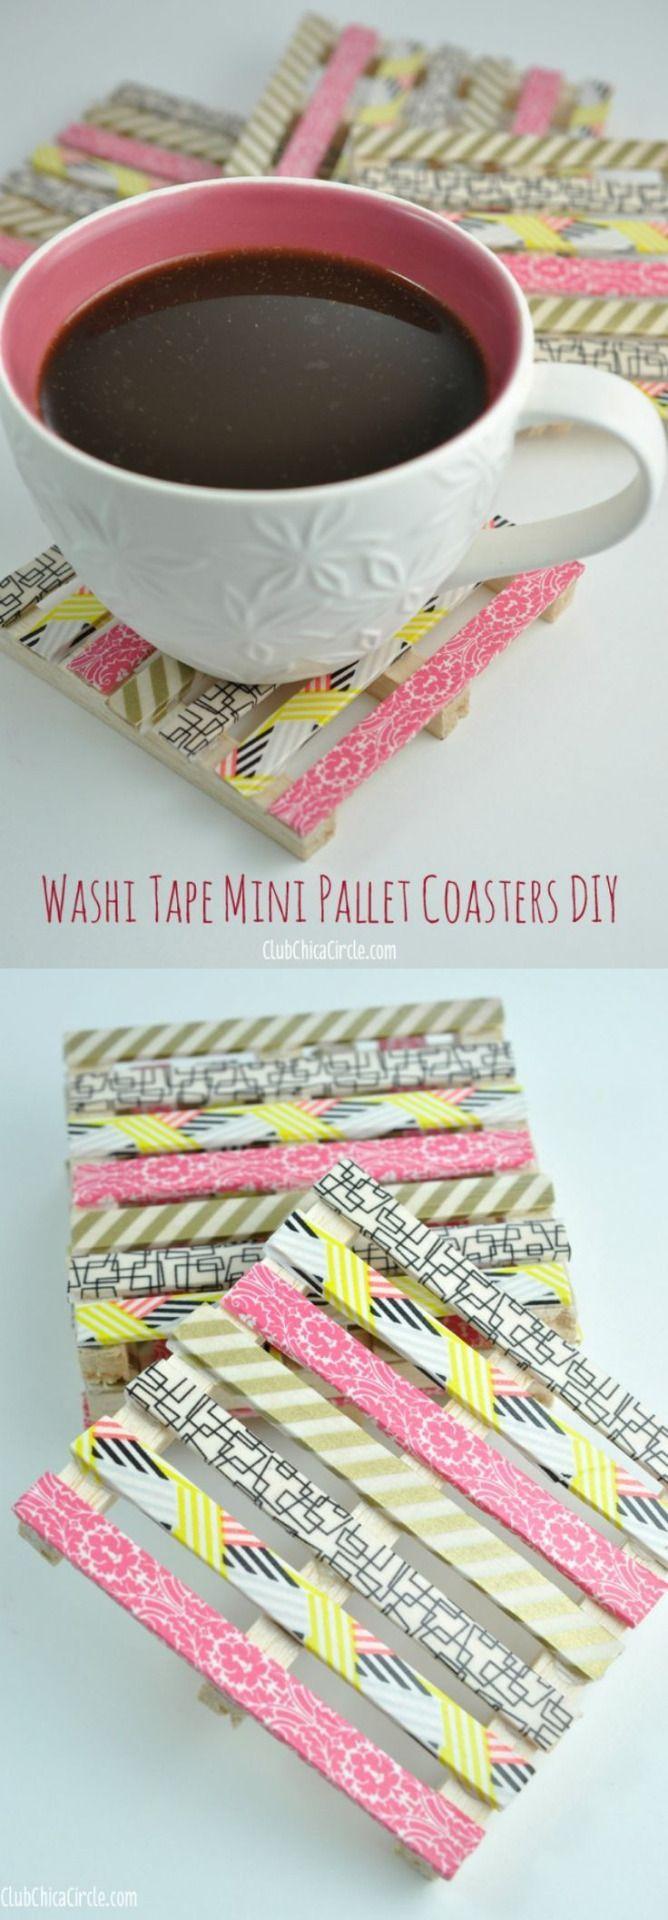 DIY WASHI TAPE MINI PALLET COASTERS